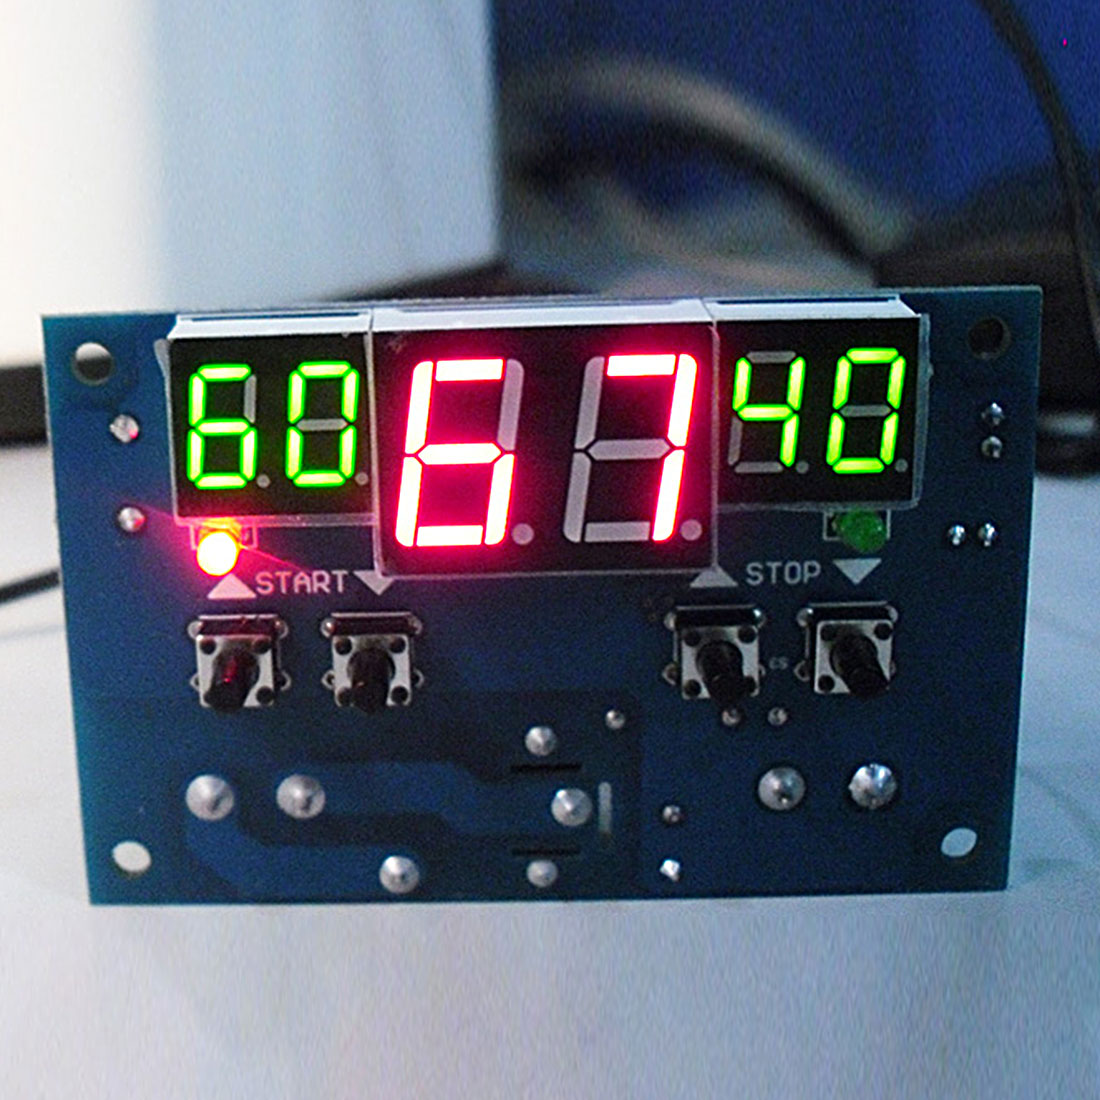 Intelligent Digital Thermostat Temperature Controller DC 12V Regulator with NTC Sensor W1401